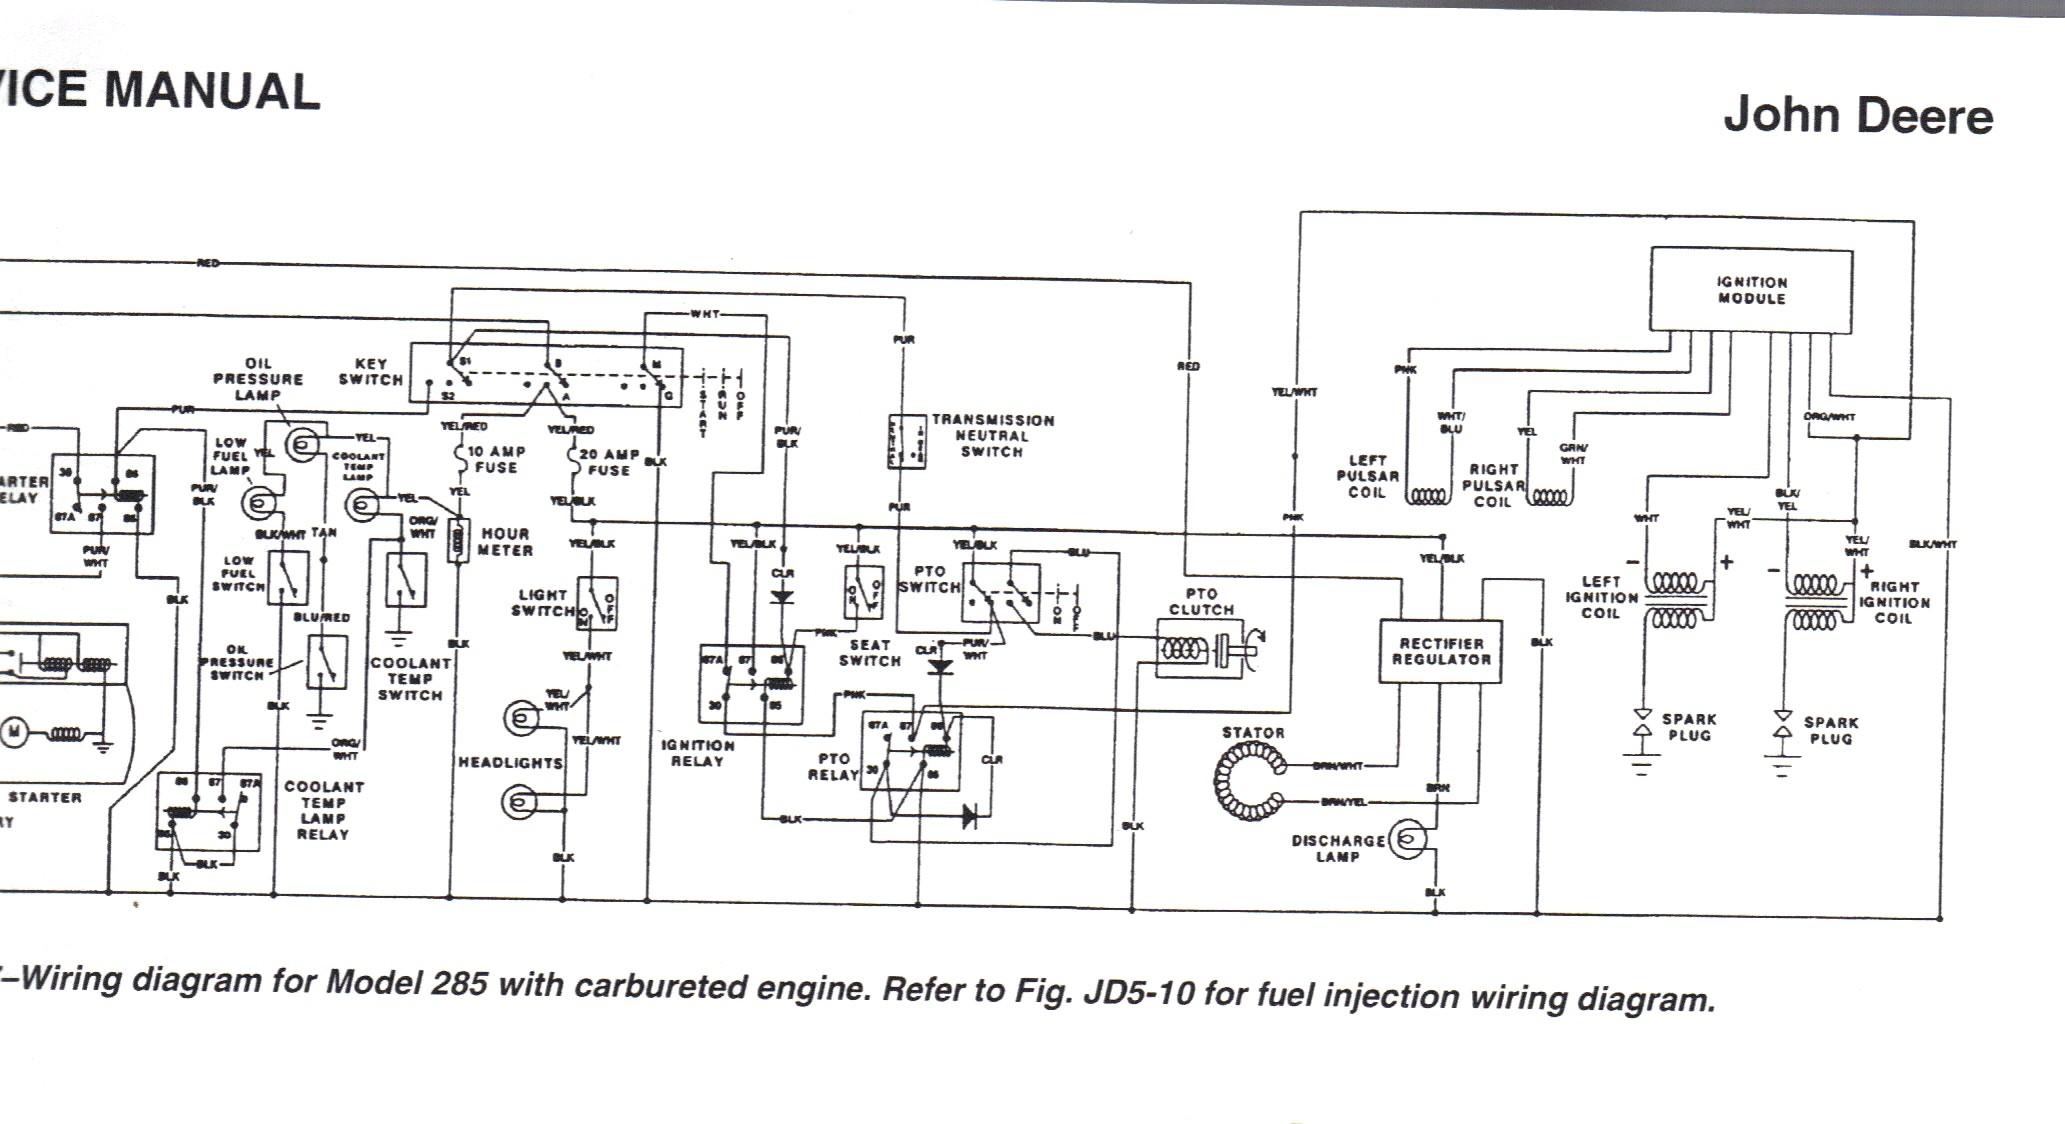 John Deere Gator Wiring Diagram Awesome Peg Perego 12v Irelandnews Best Diagrams Of